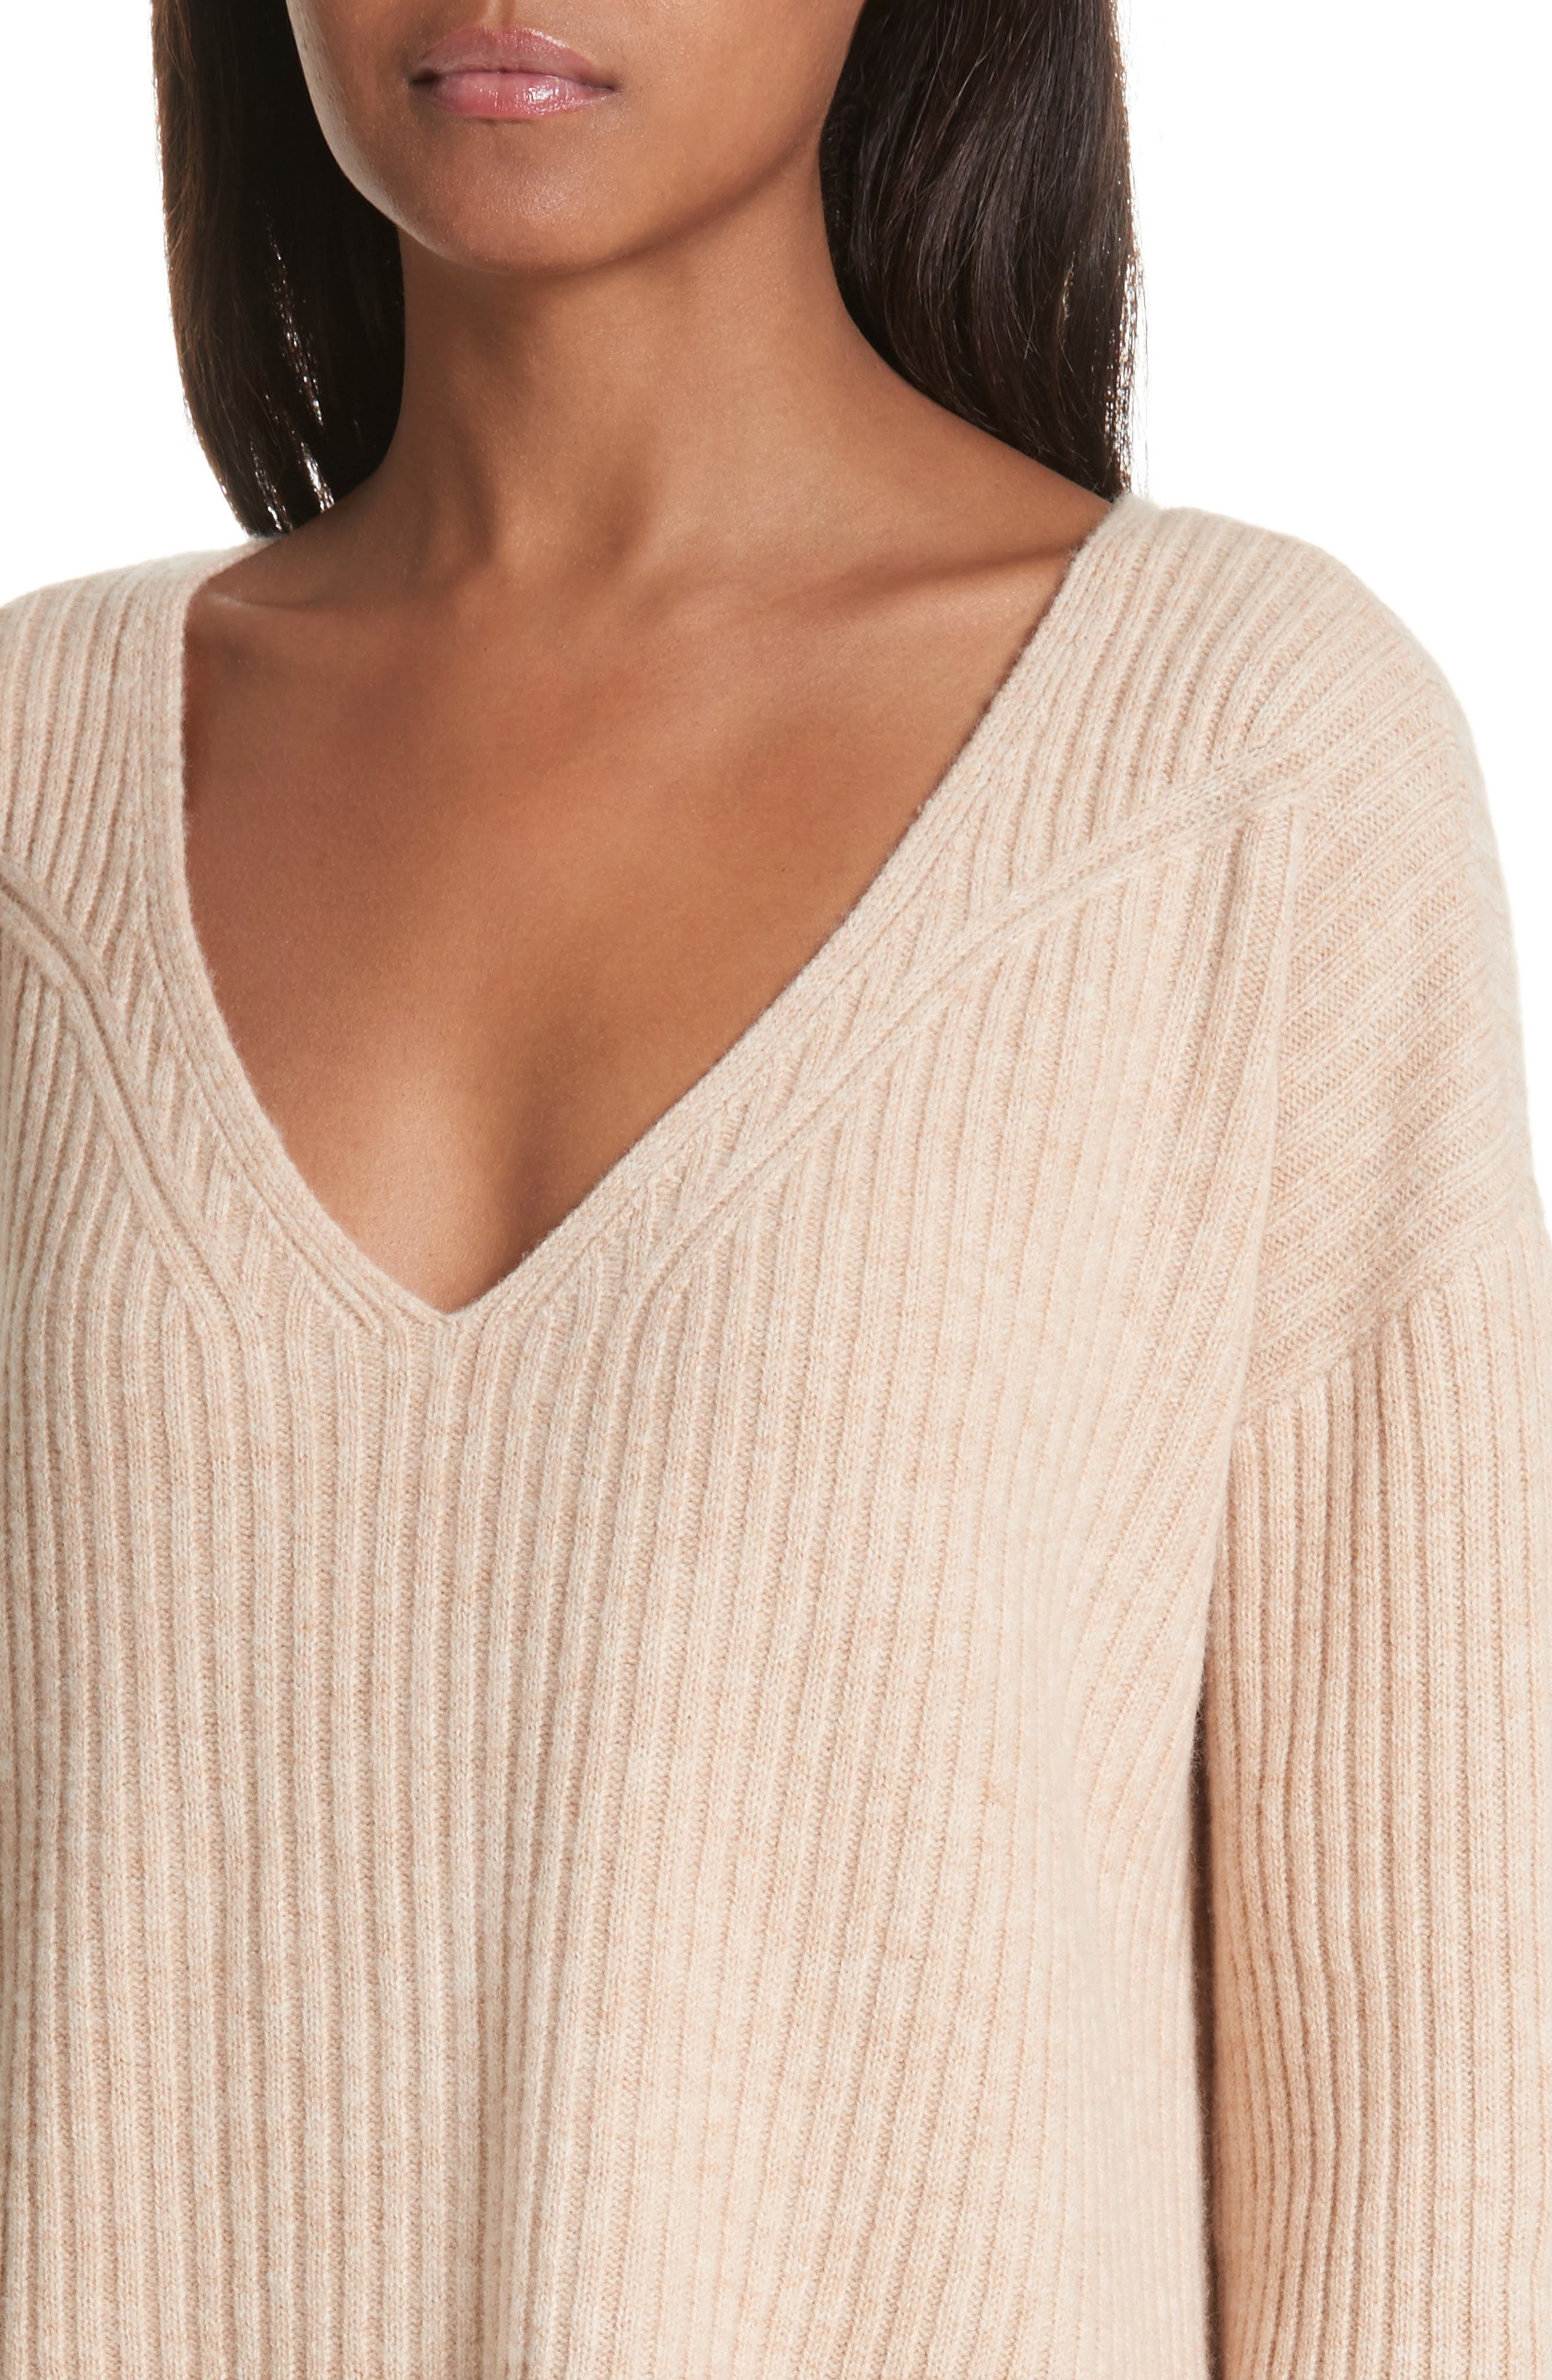 Mitchell Merino Wool Sweater,                             Alternate thumbnail 4, color,